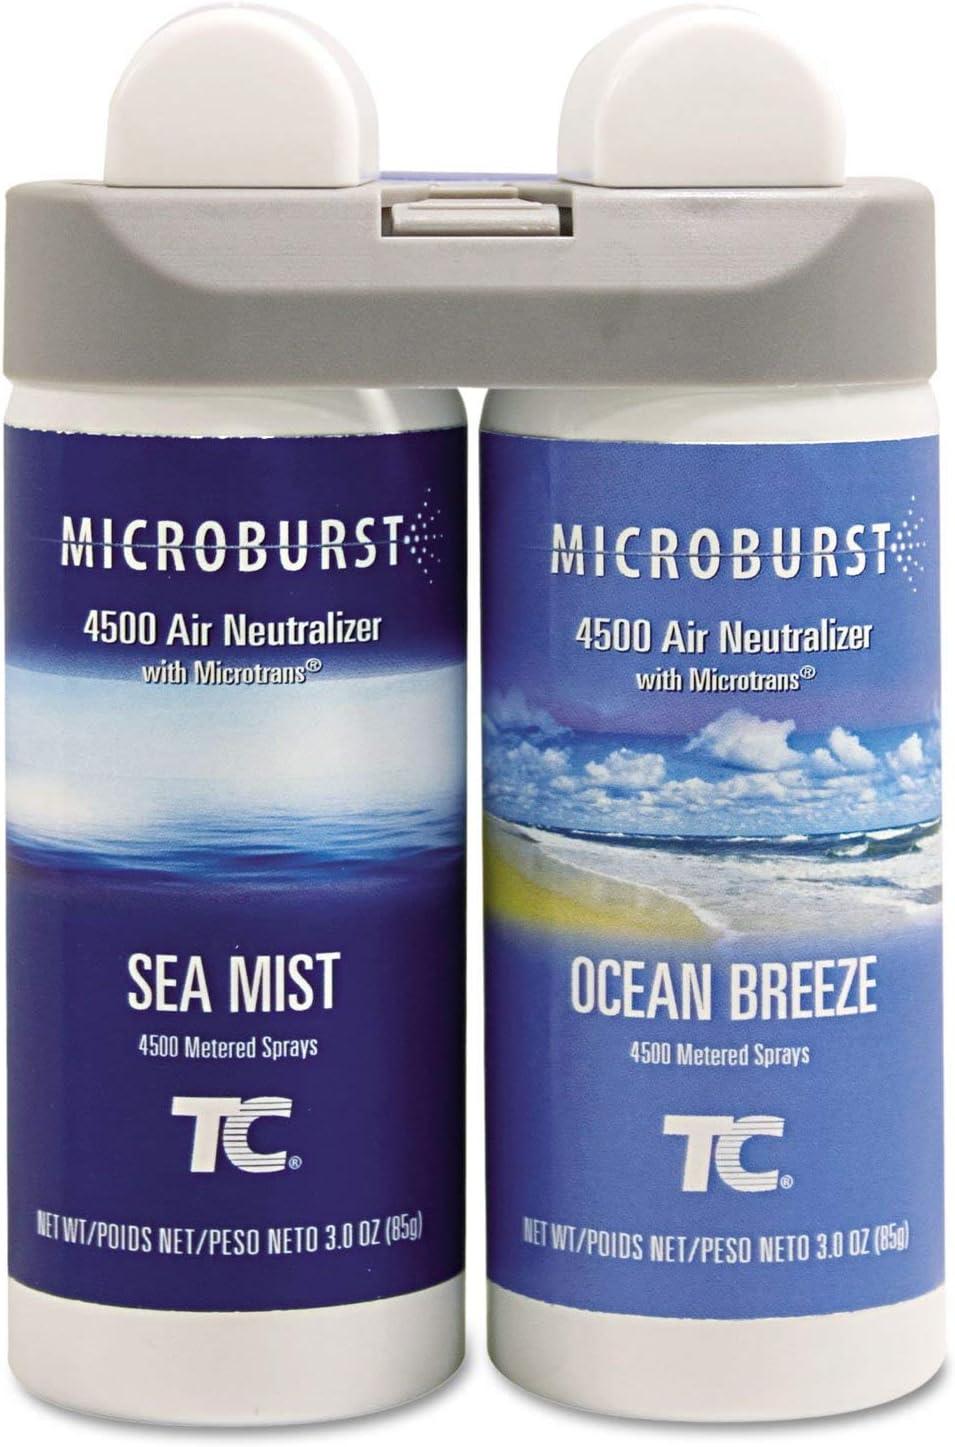 Rubbermaid Commercial Sale item 3485951 Microburst Charlotte Mall Sea Mist Refills Duet